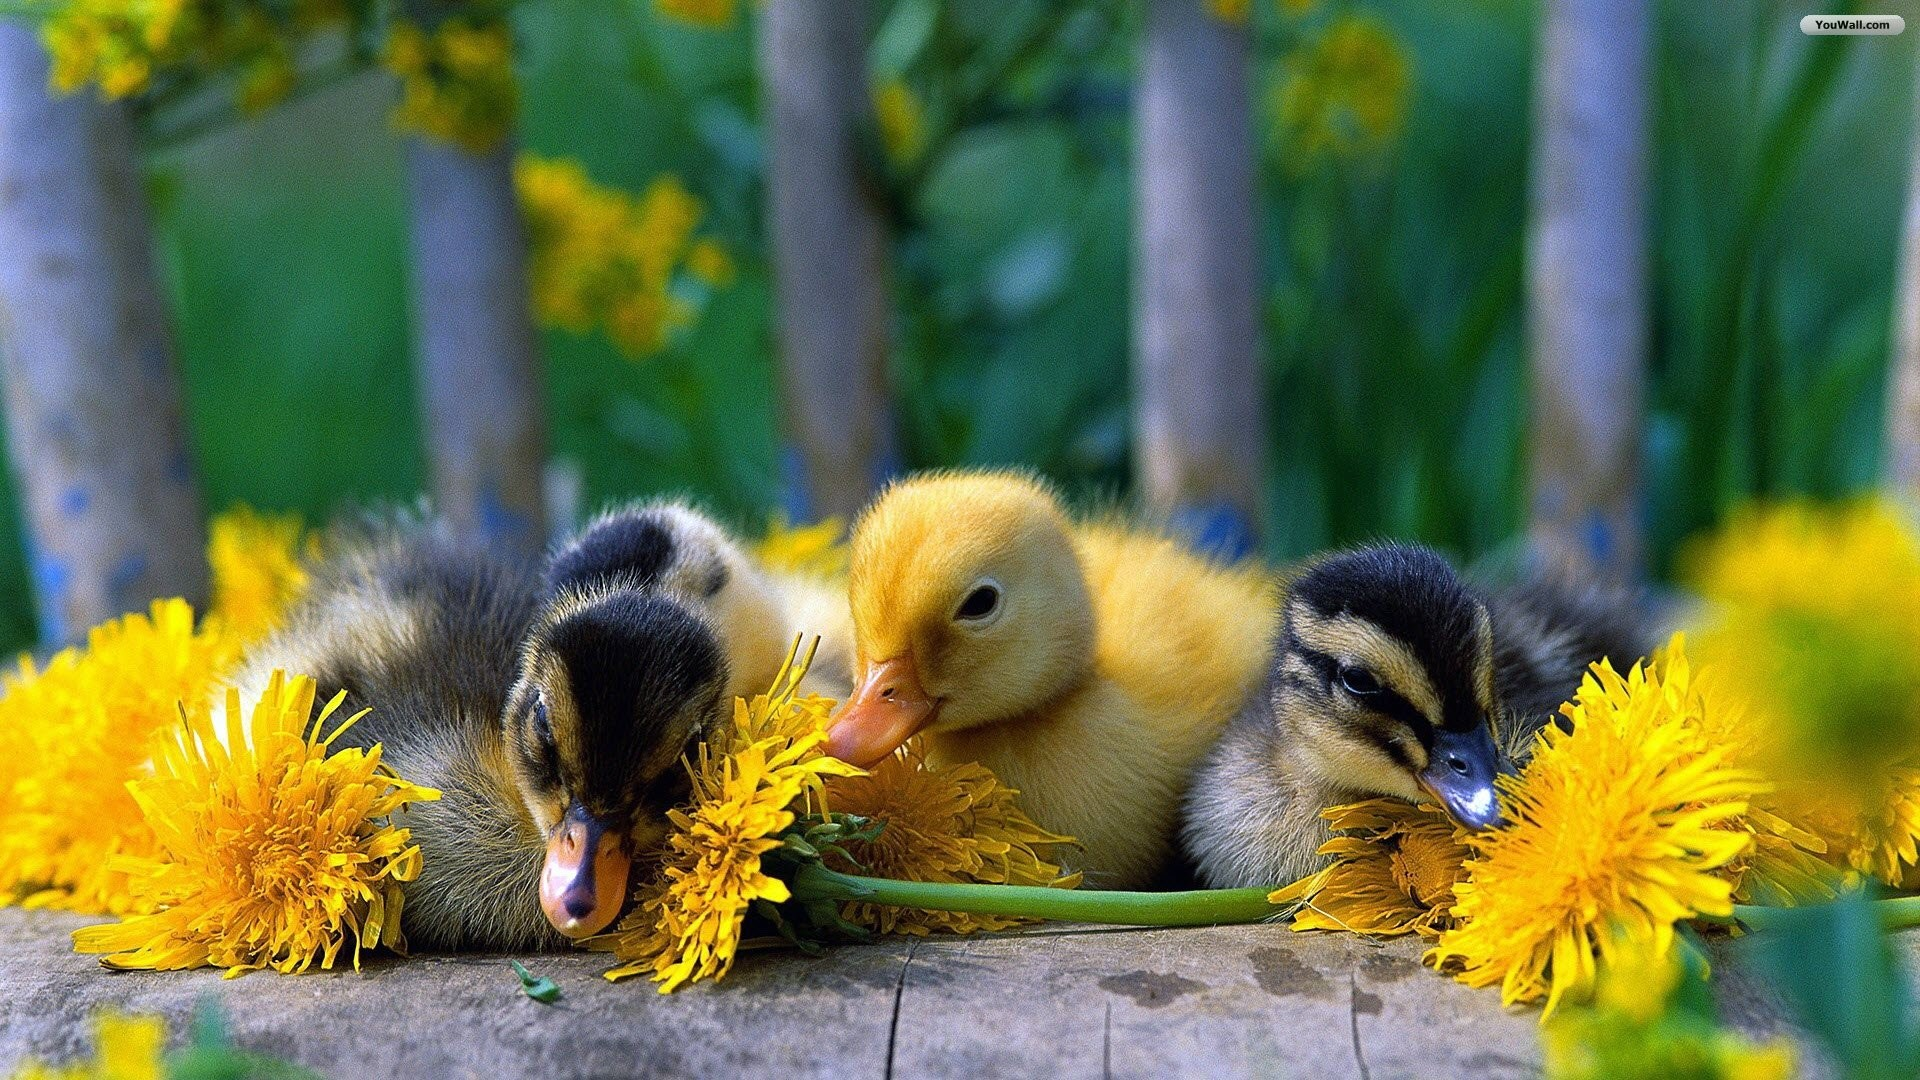 Cute Baby Duck Wallpaper, .